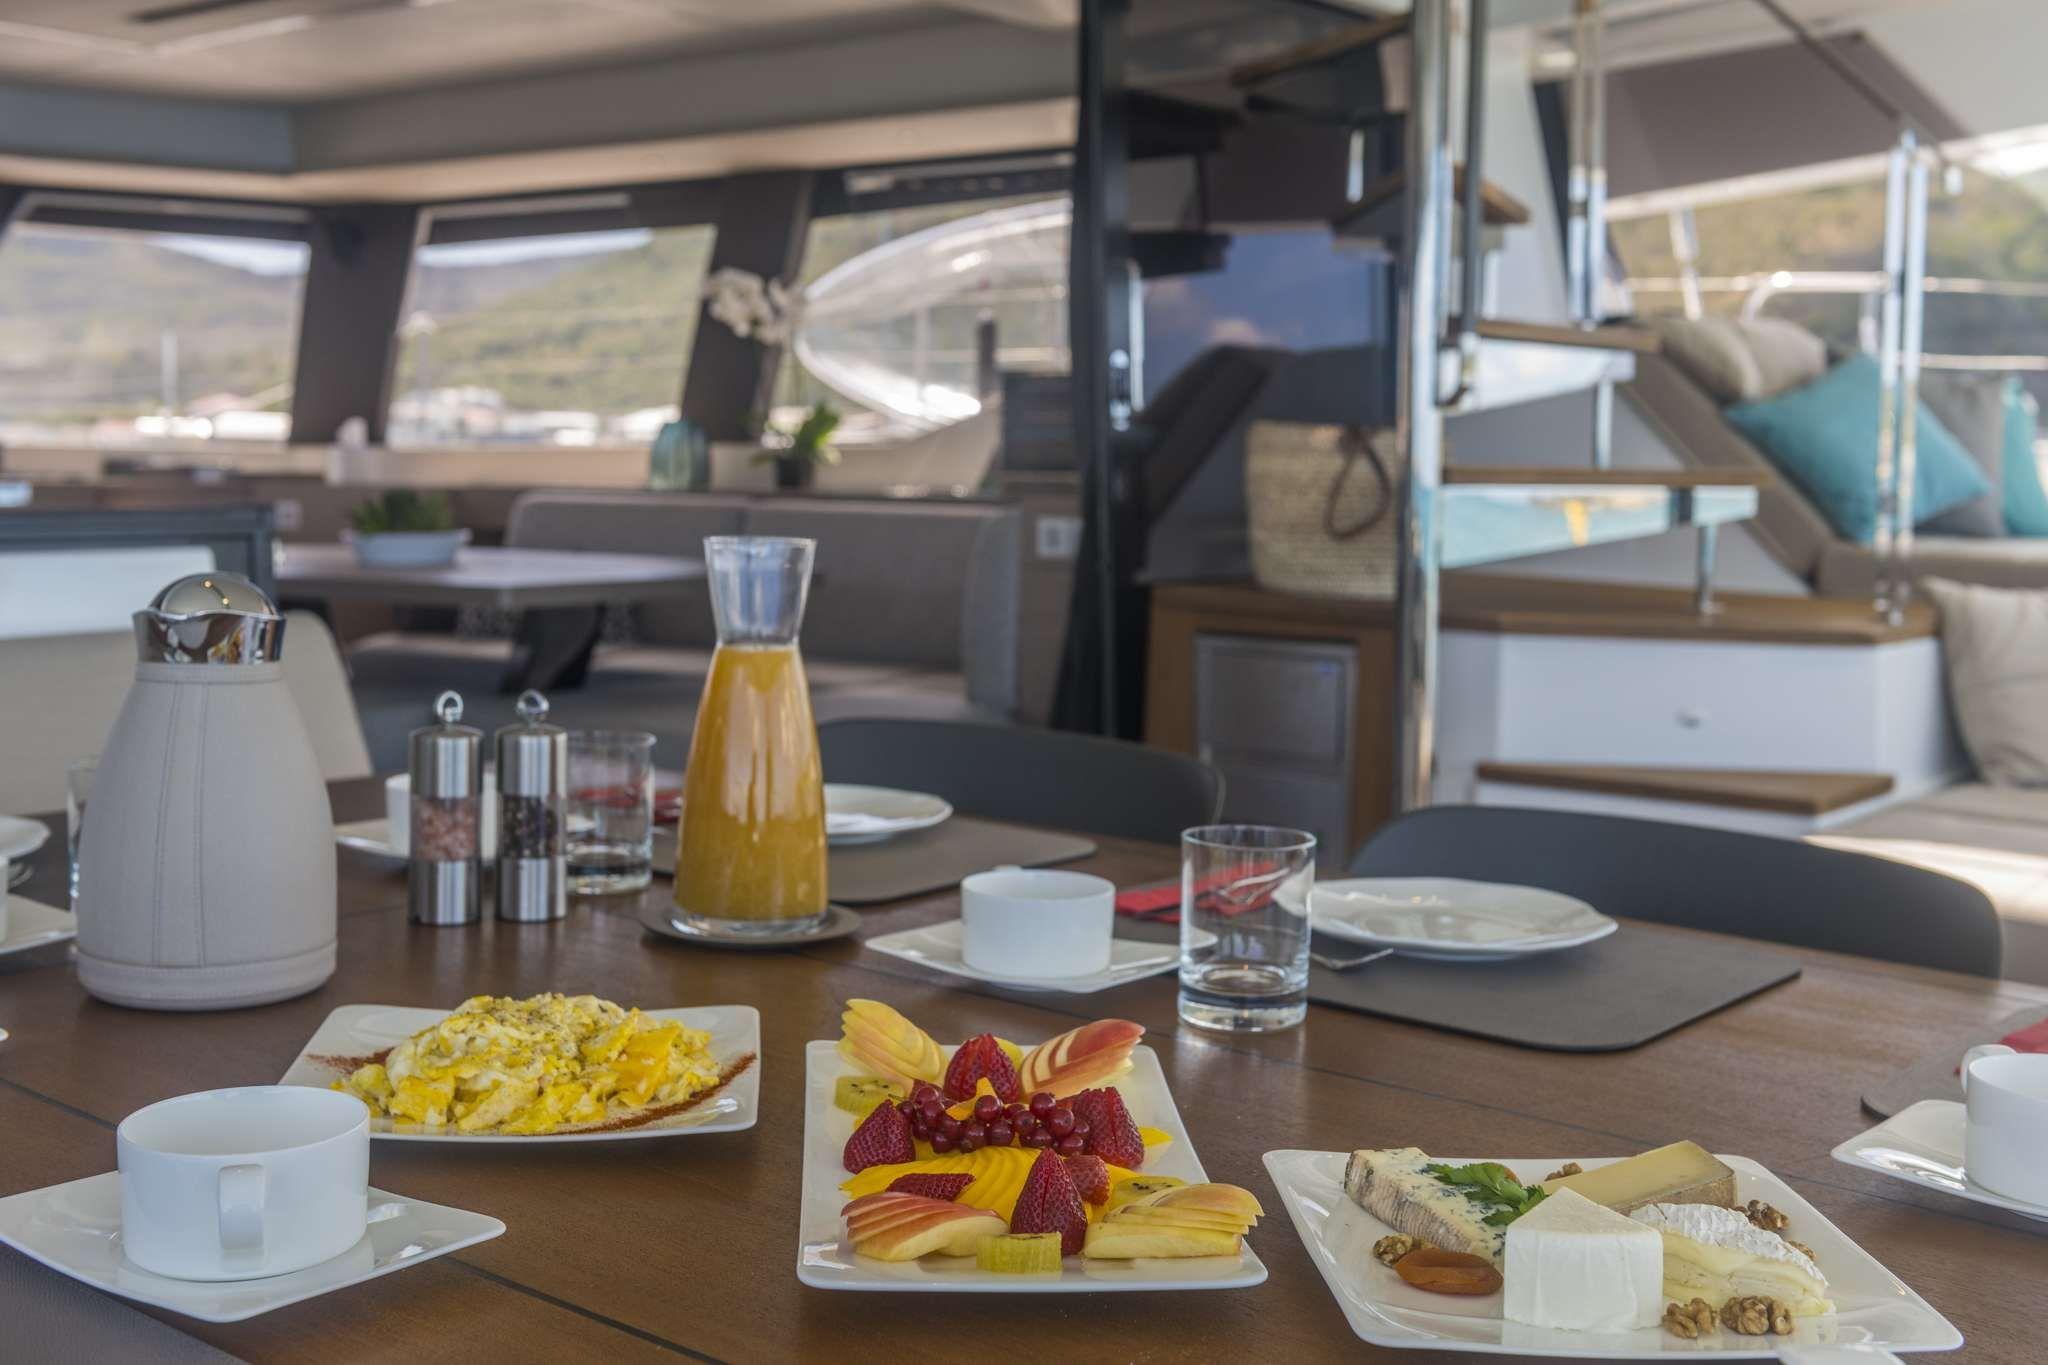 Lifestyle - Breakfast on Aft Deck